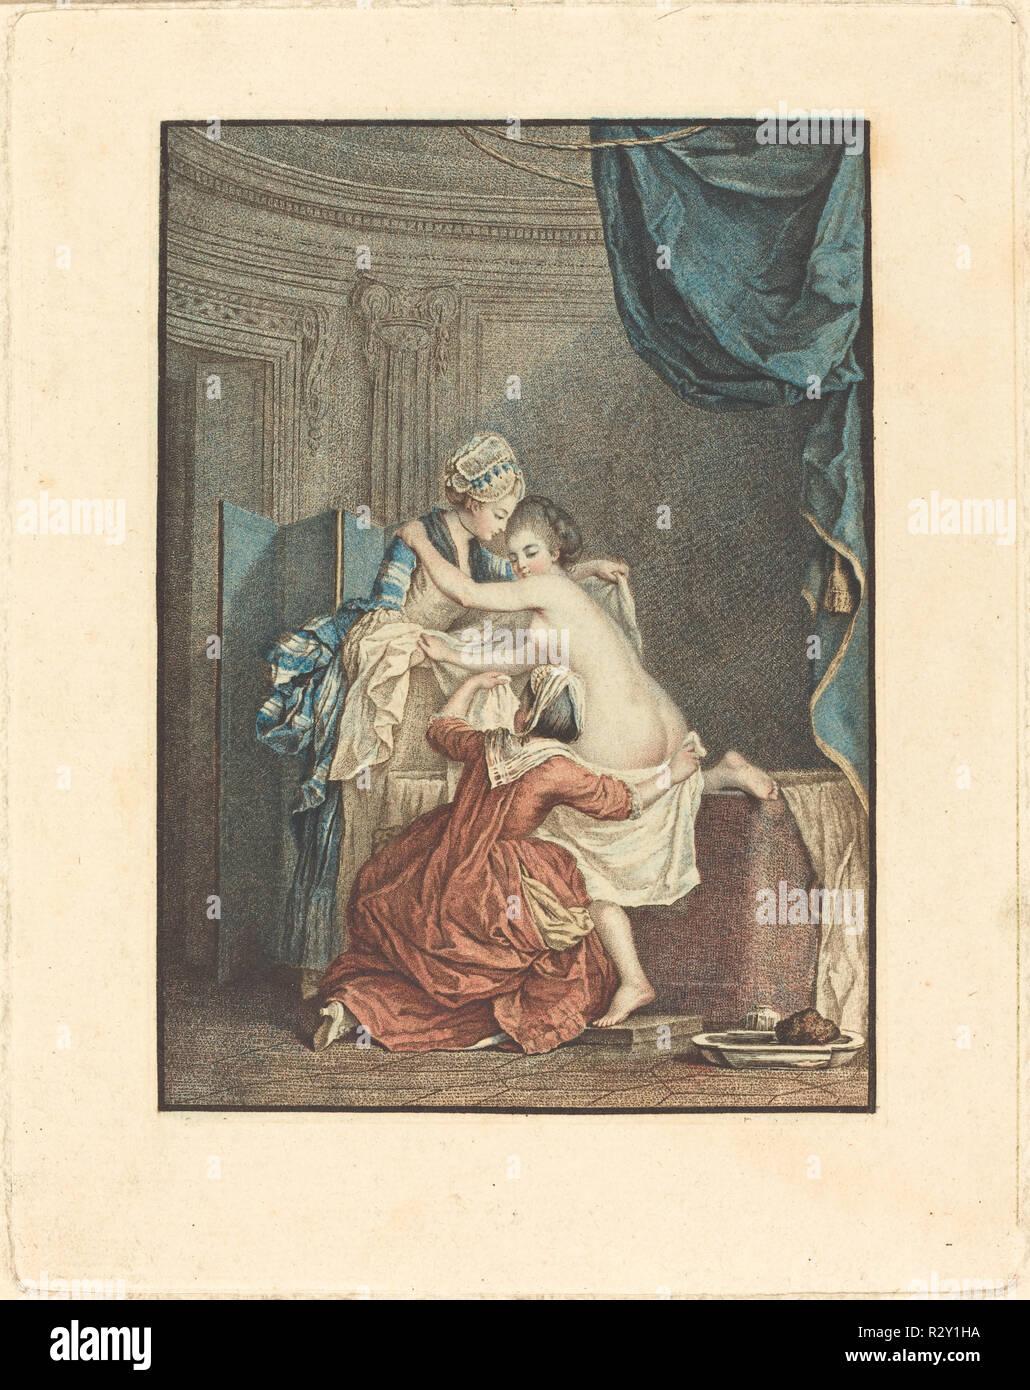 Le bain (The Bath). Medium: color stipple etching and etching. Museum: National Gallery of Art, Washington DC. Author: Nicolas François Regnault after Pierre-Antoine Baudouin. Stock Photo